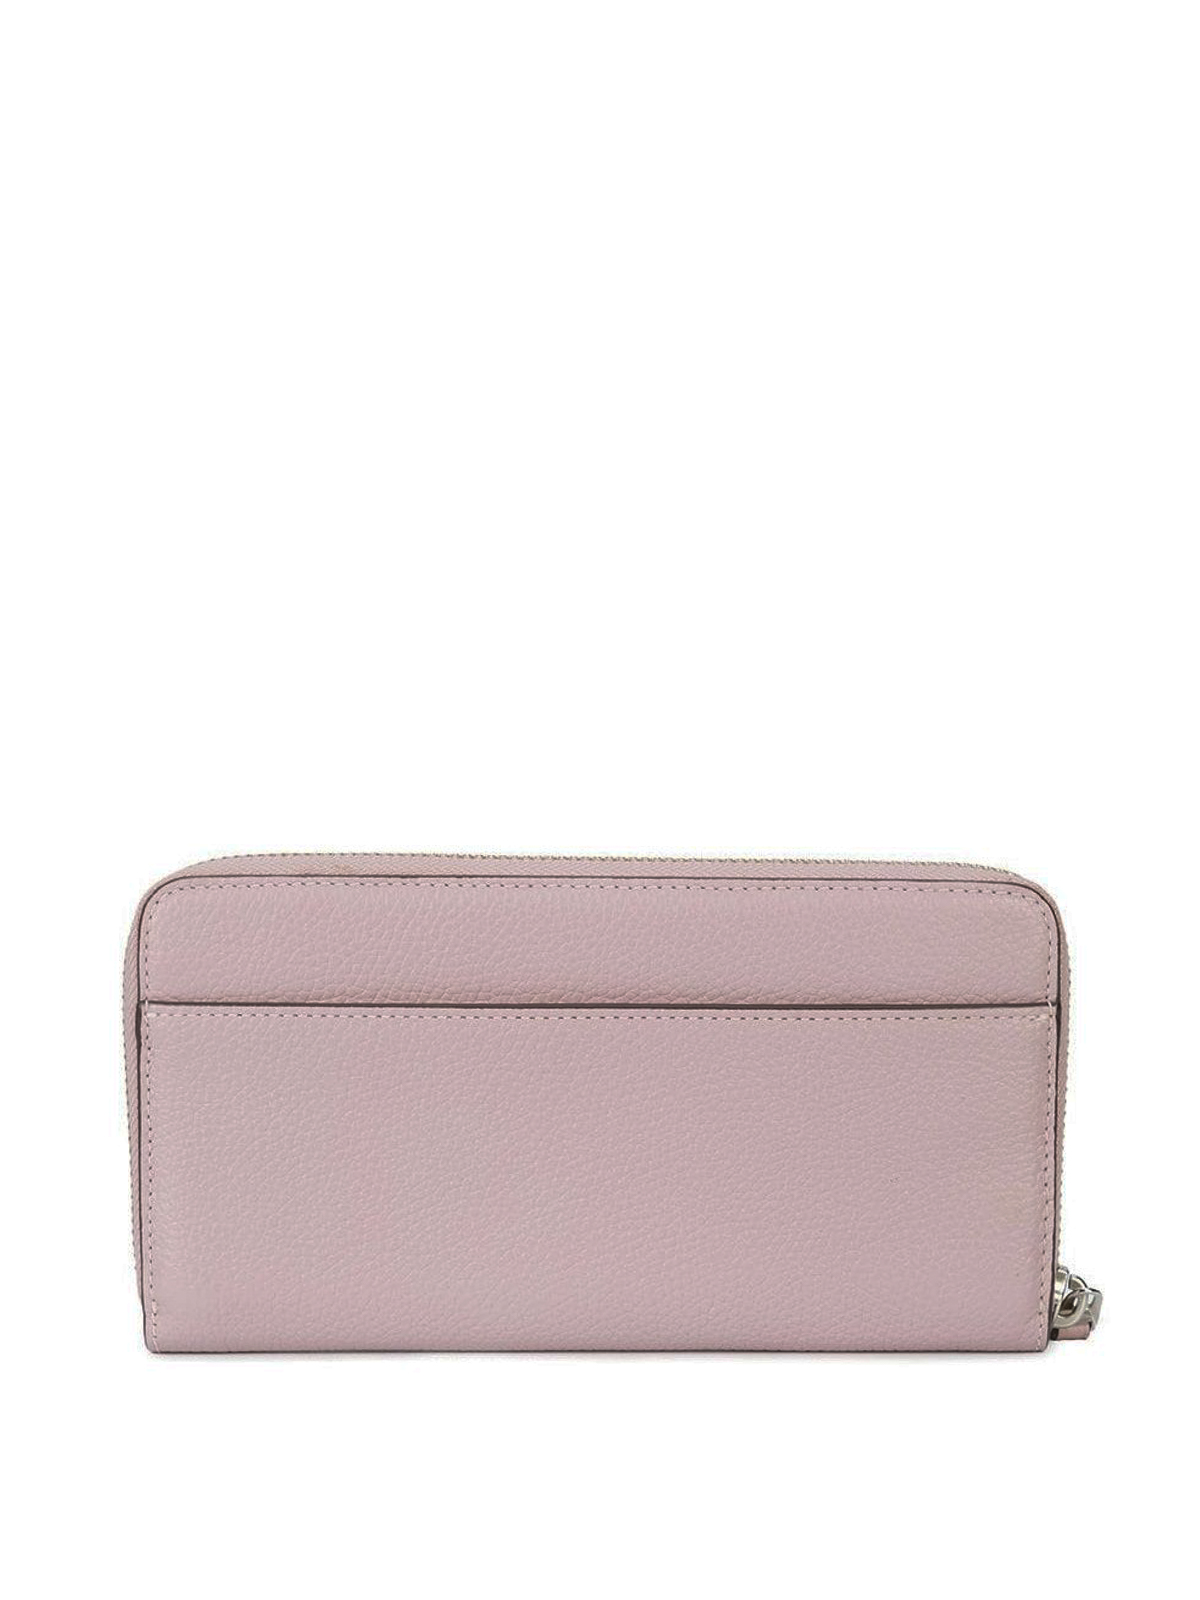 dad567eb7dc3 COACH  wallets   purses online - Accordion zip around leather wallet